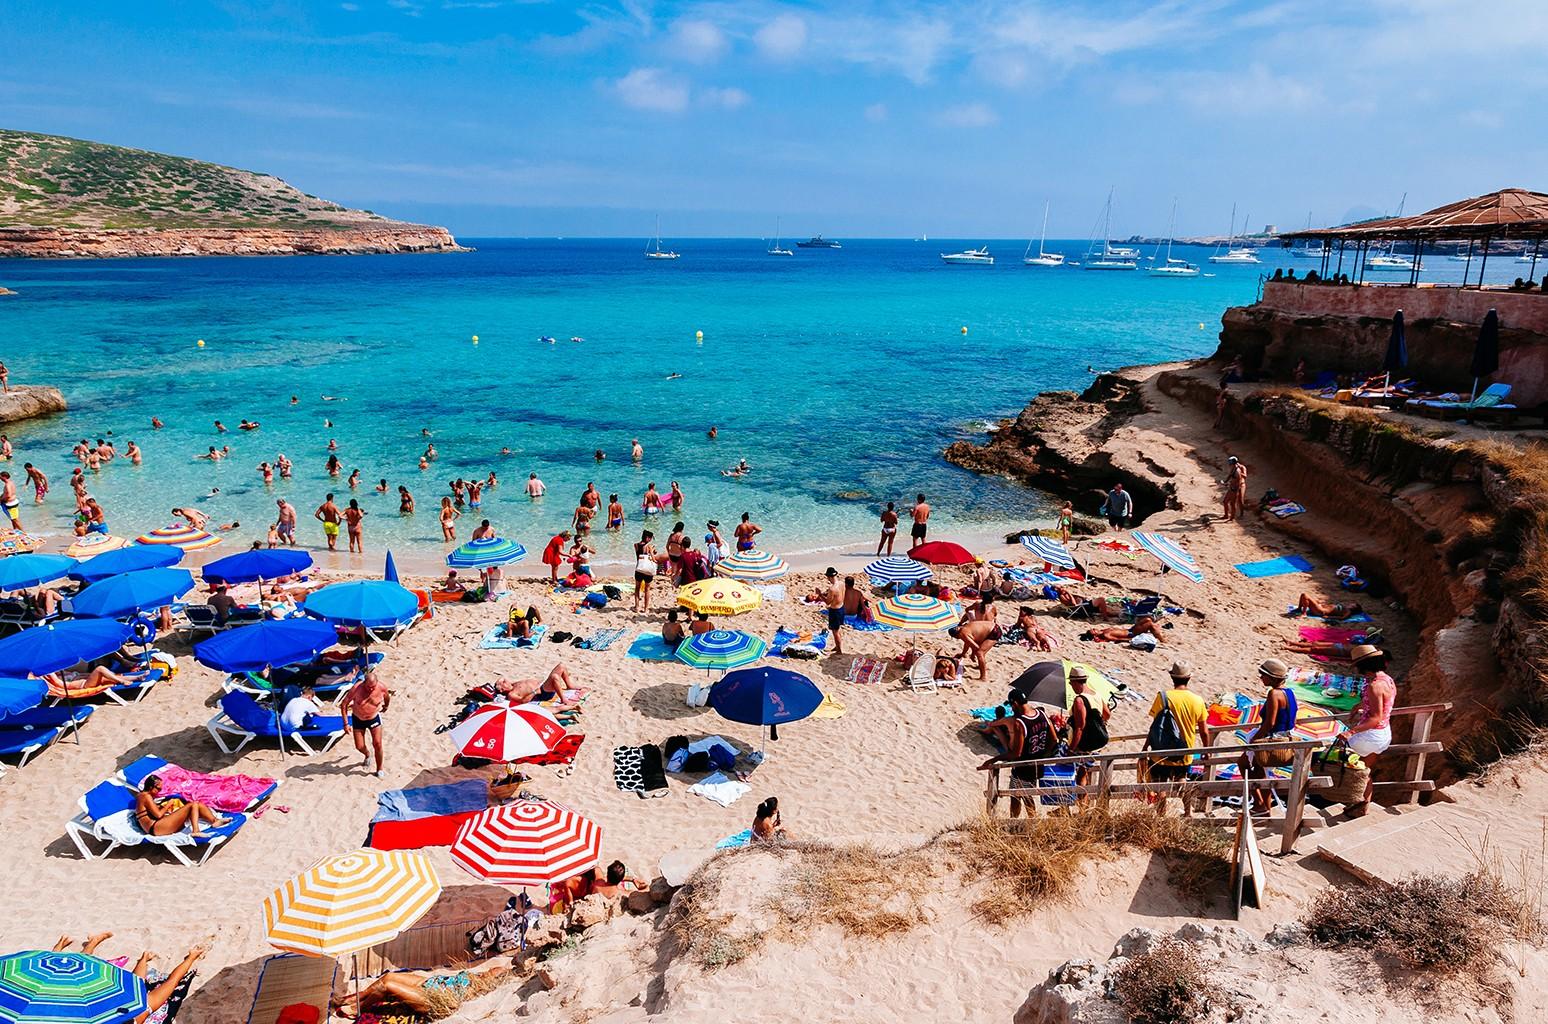 Tourists in Ibiza, Spain.